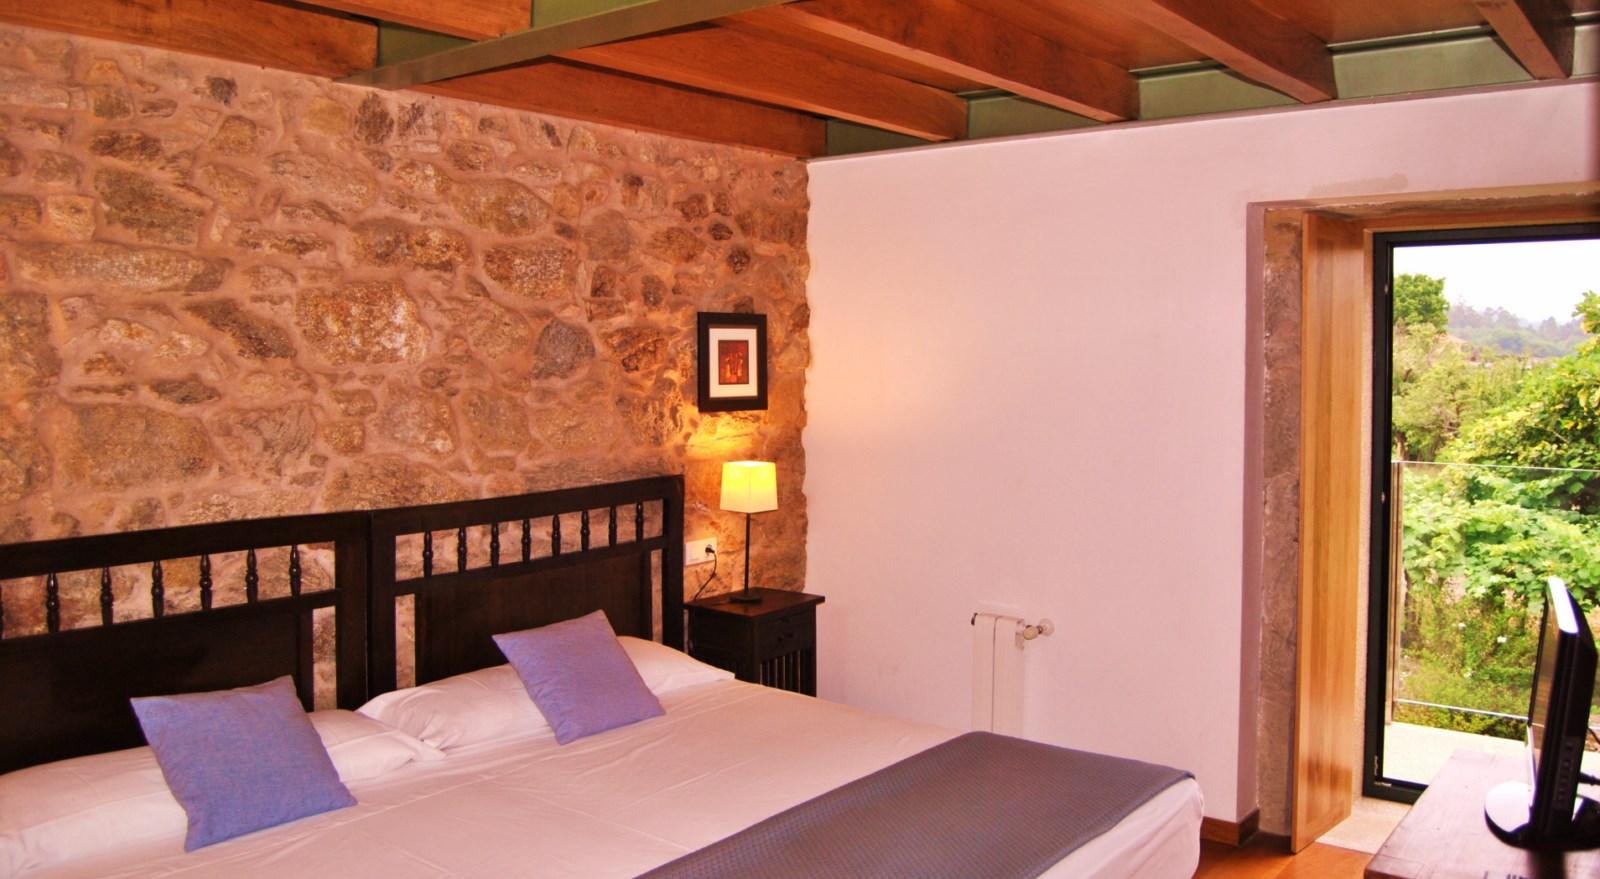 cuarto Torres d Moreda 1600x1200